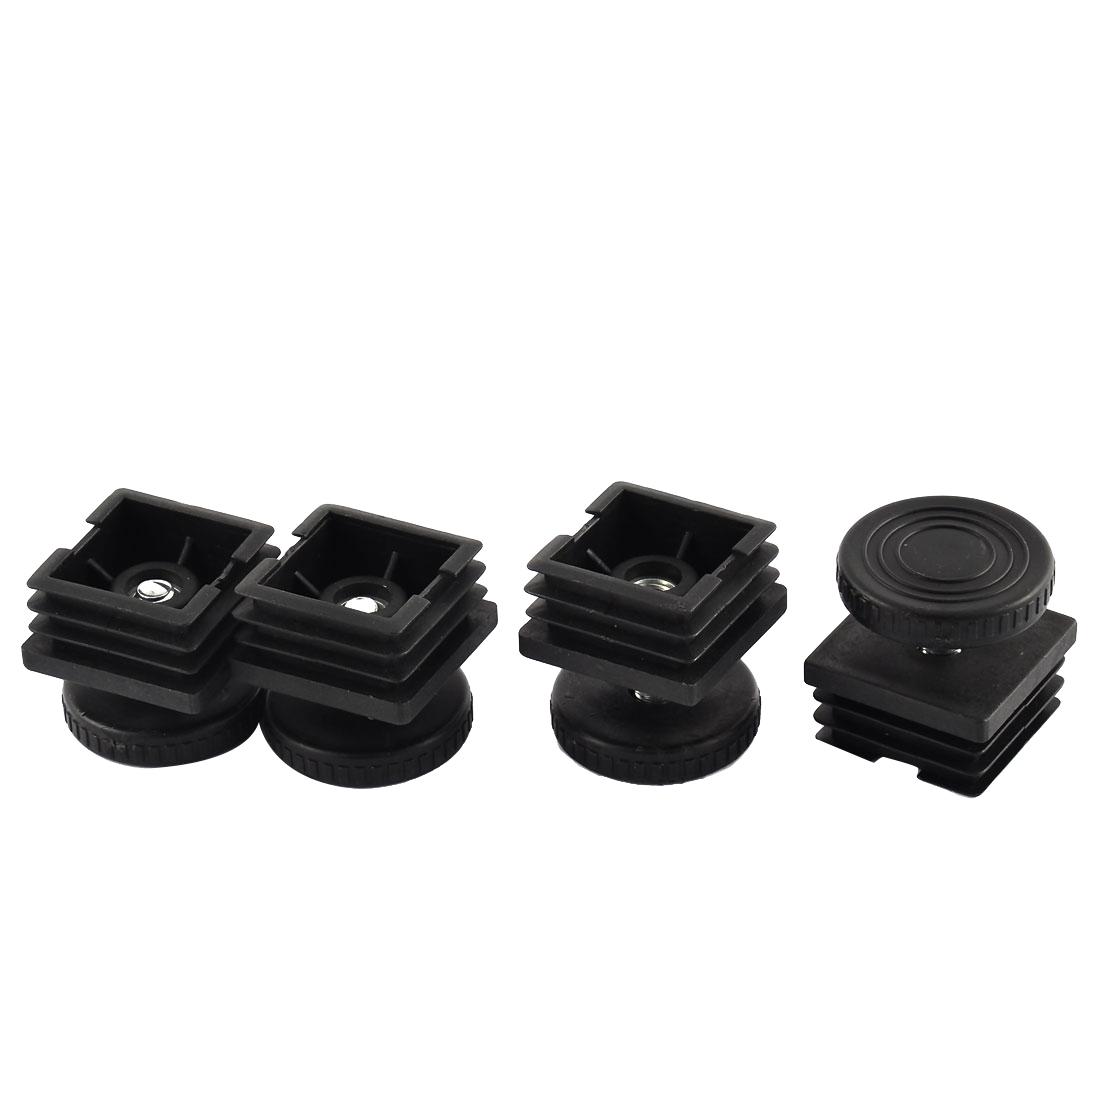 4 Sets 40mm Base Dia Adjustable Leveling Foot 36mm x 36mm Square Tube Insert Kit